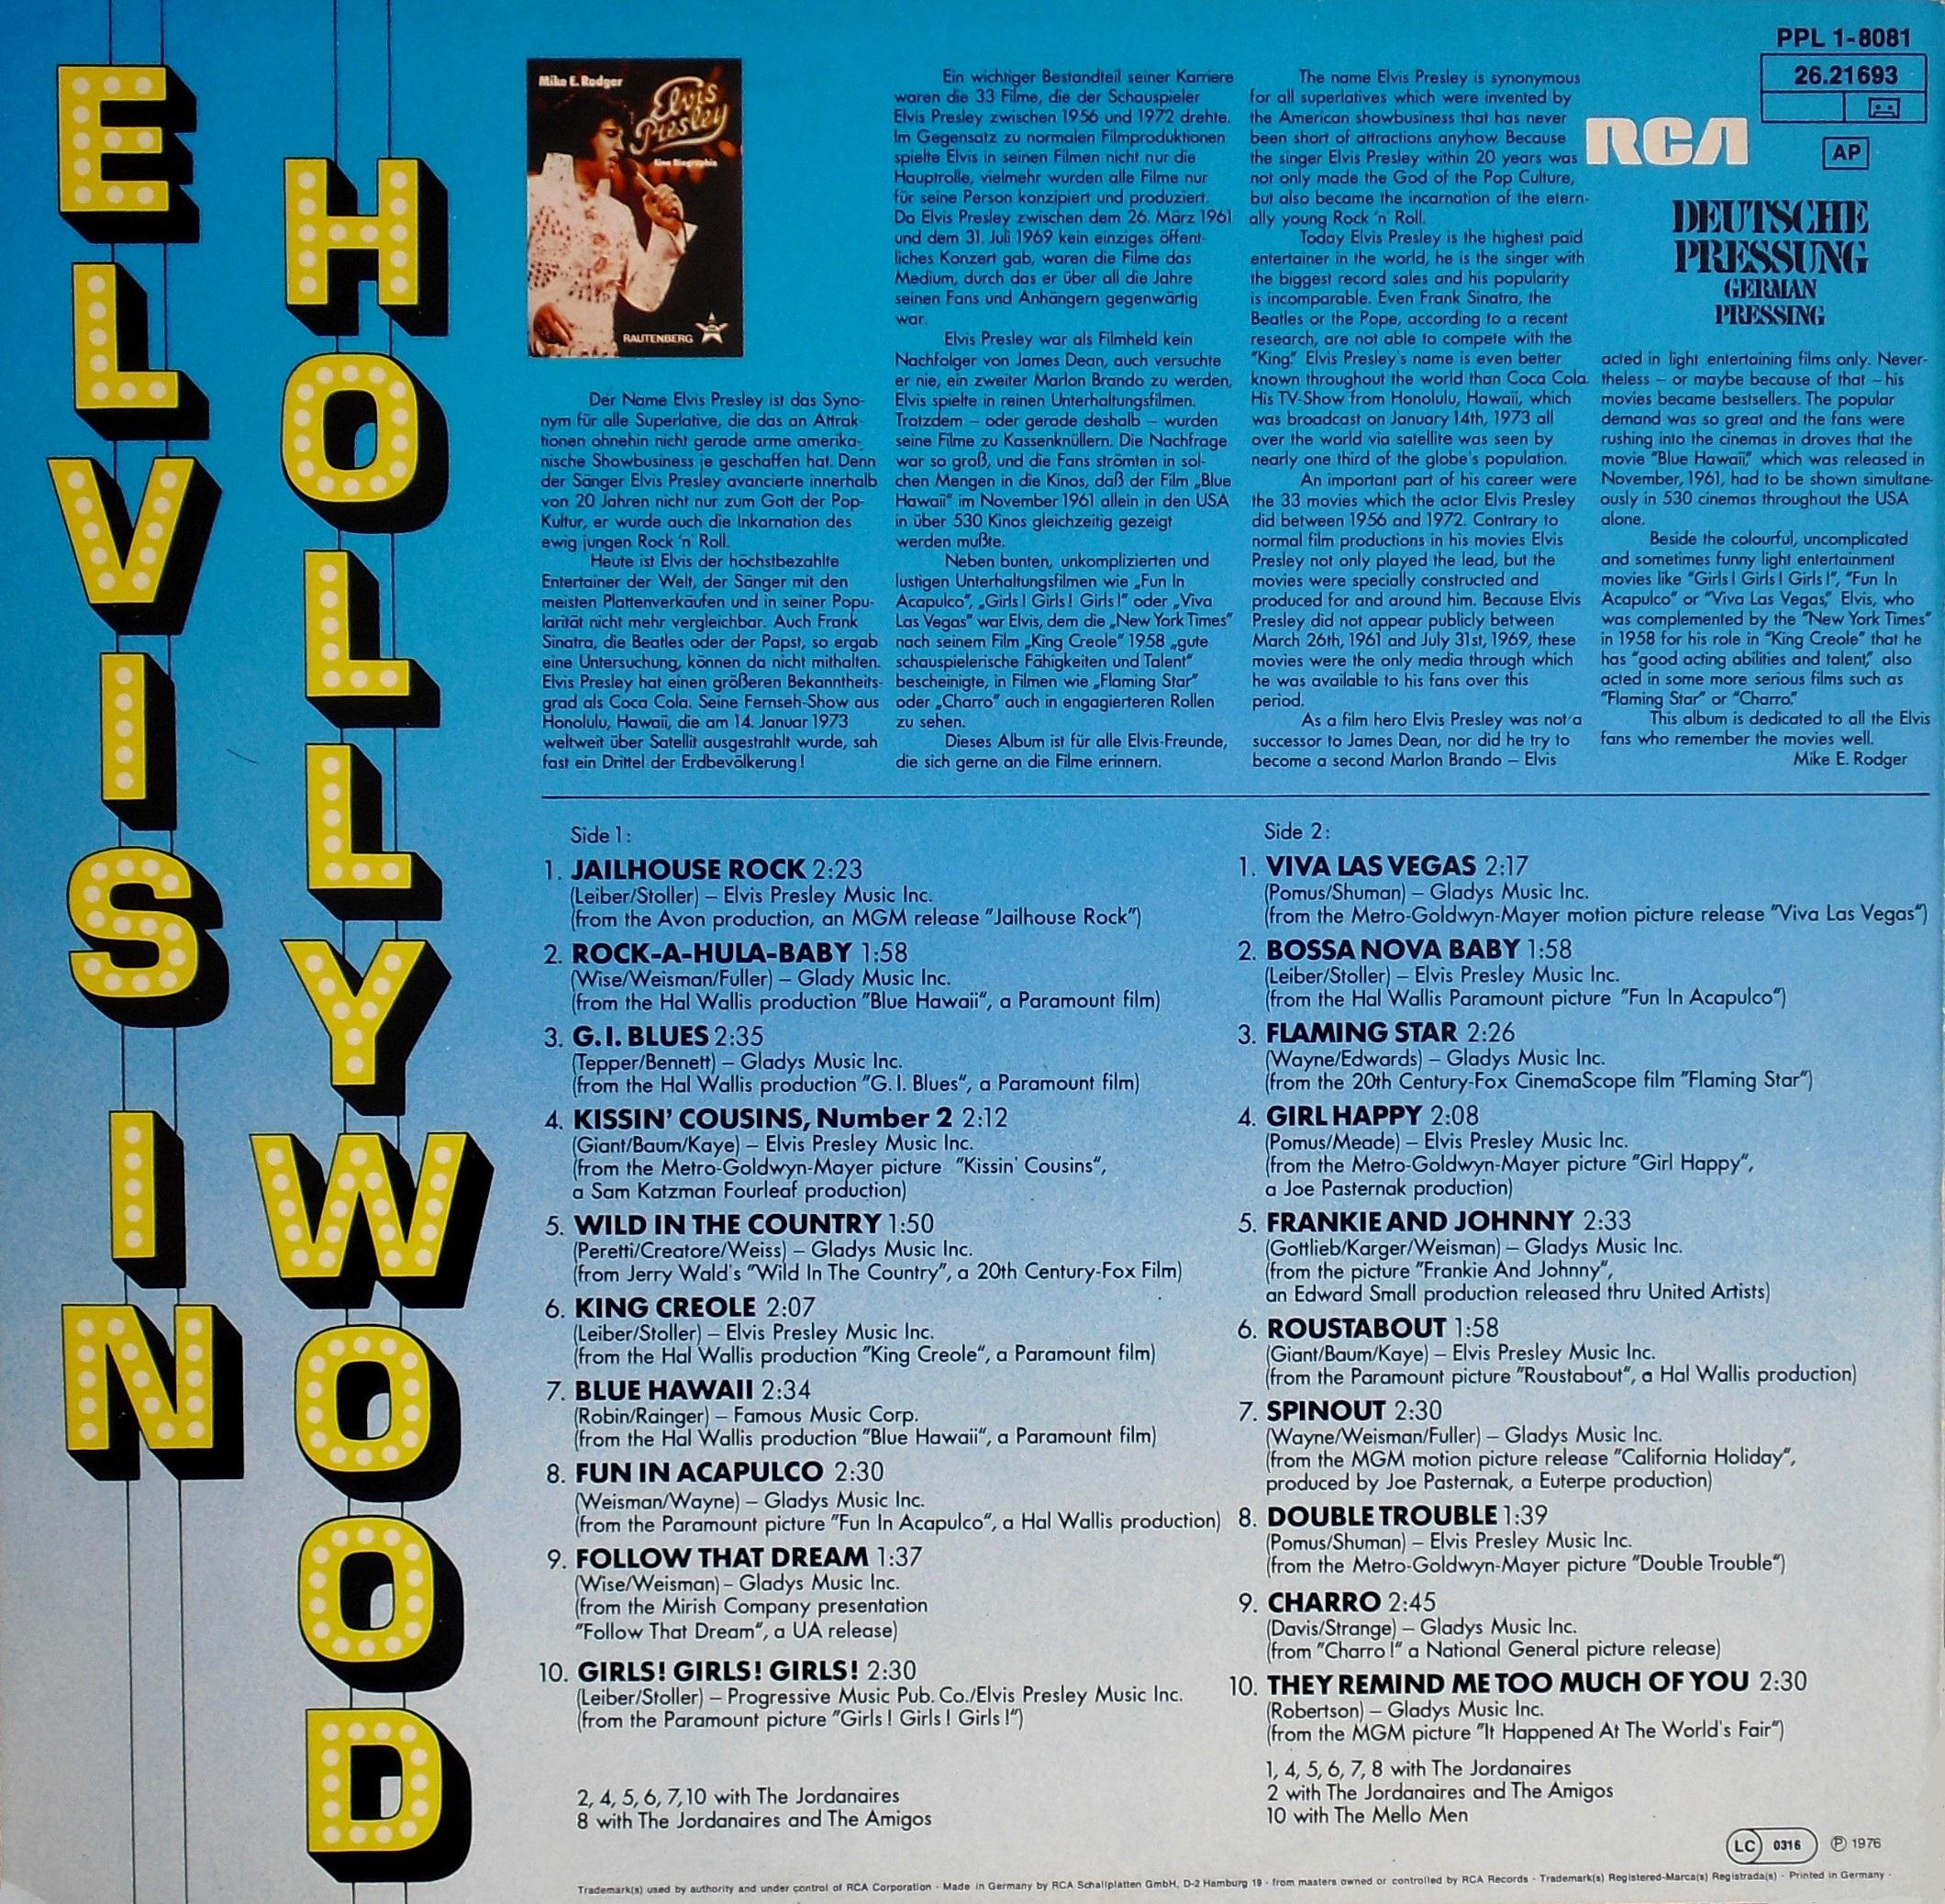 ELVIS IN HOLLYWOOD 02akxqr